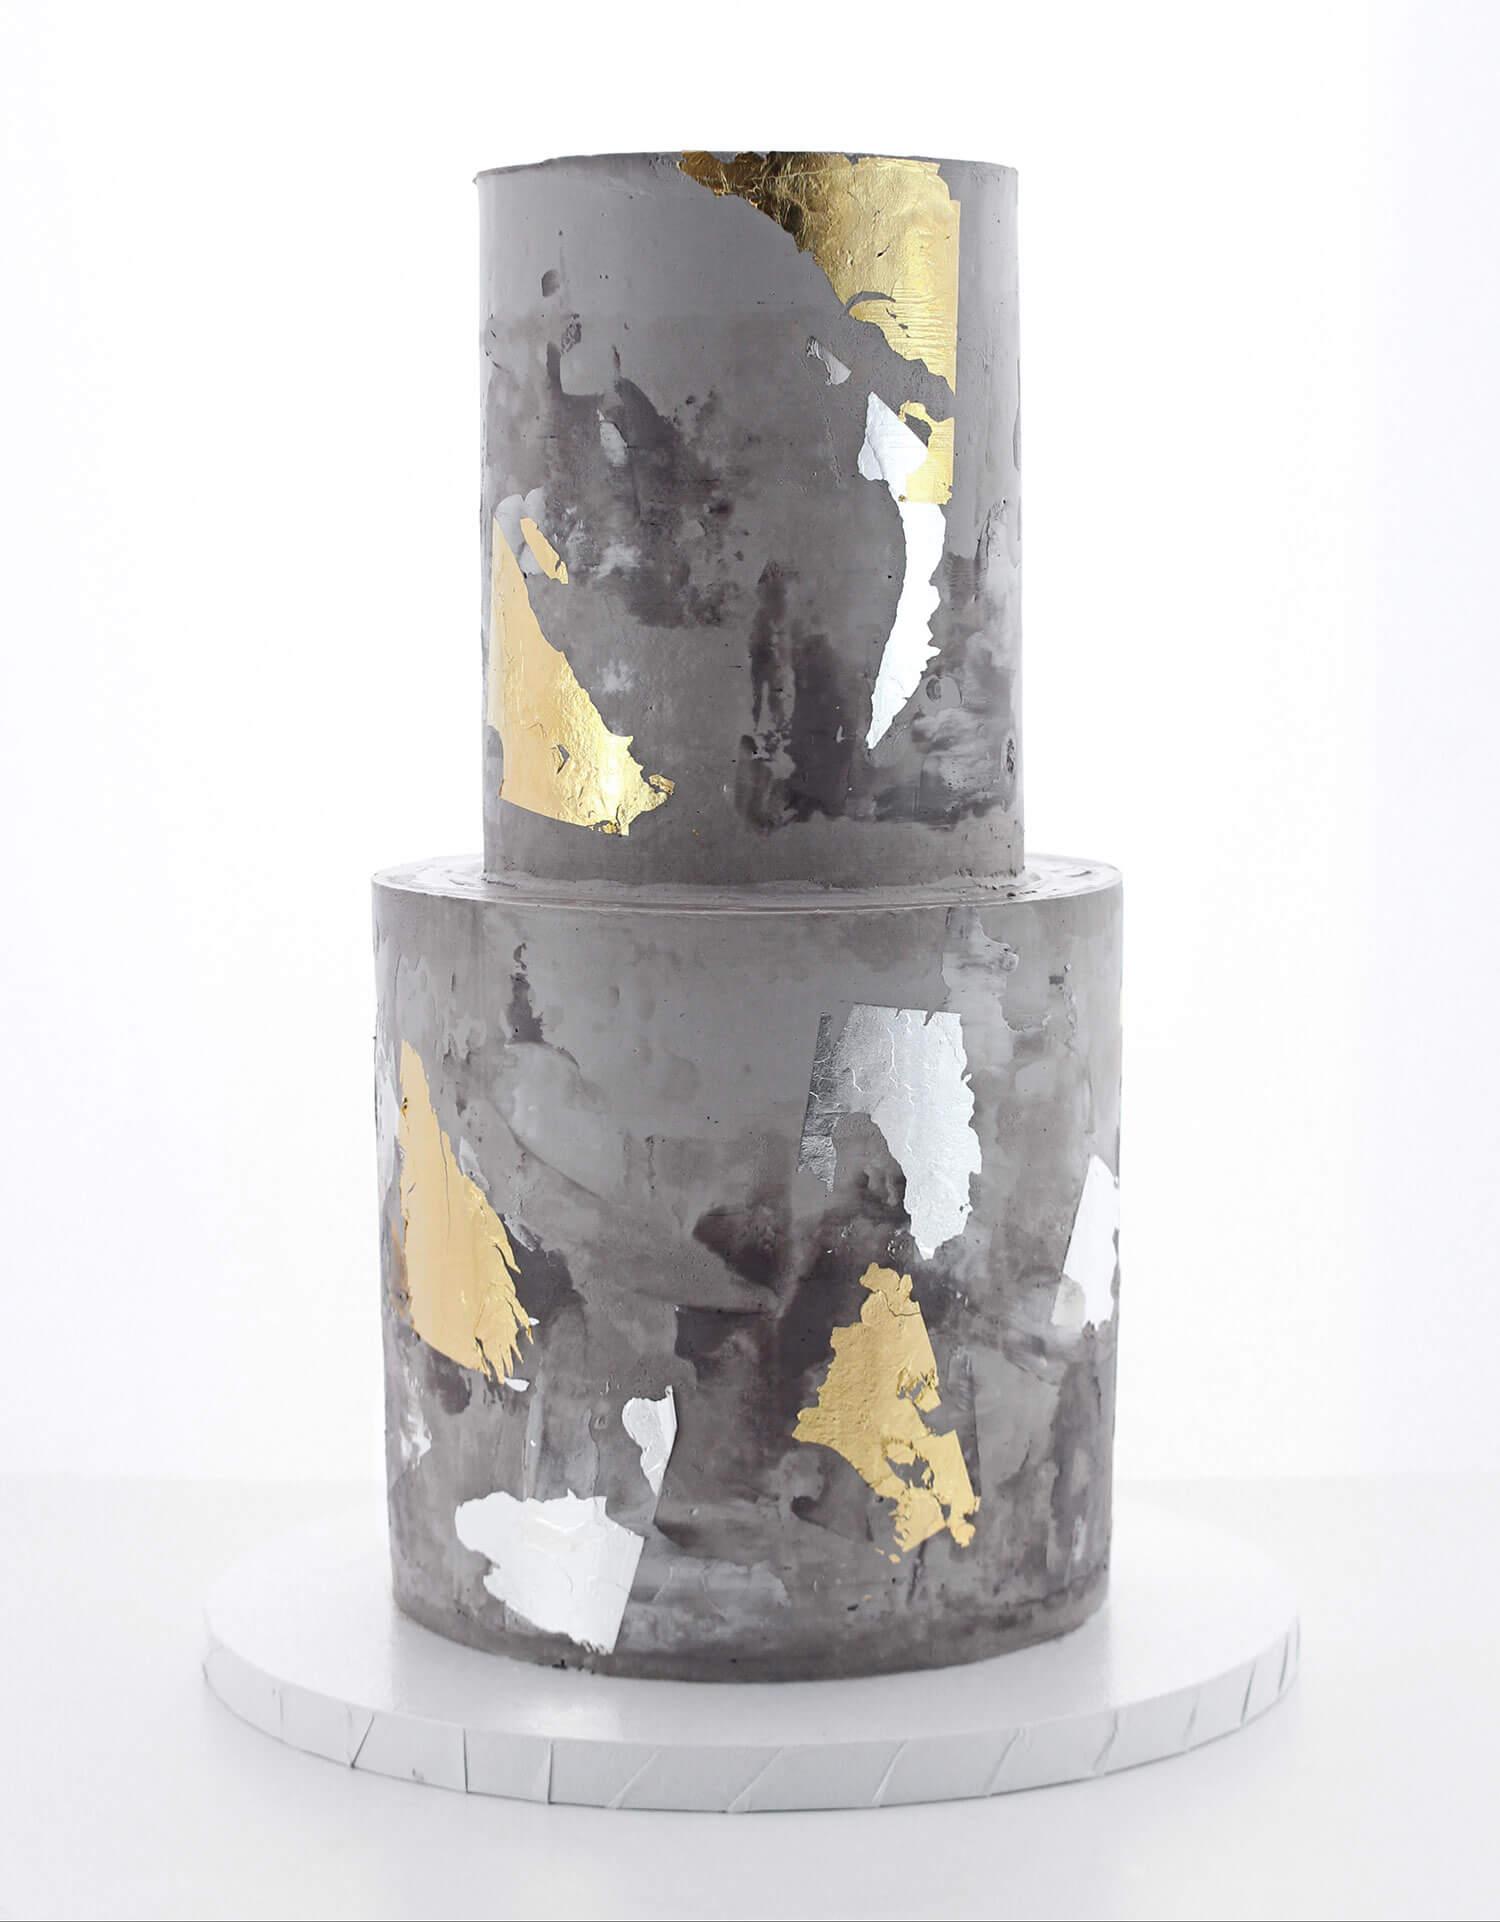 Mariska-Schoeman---ConcreteCakeCropped.jpg